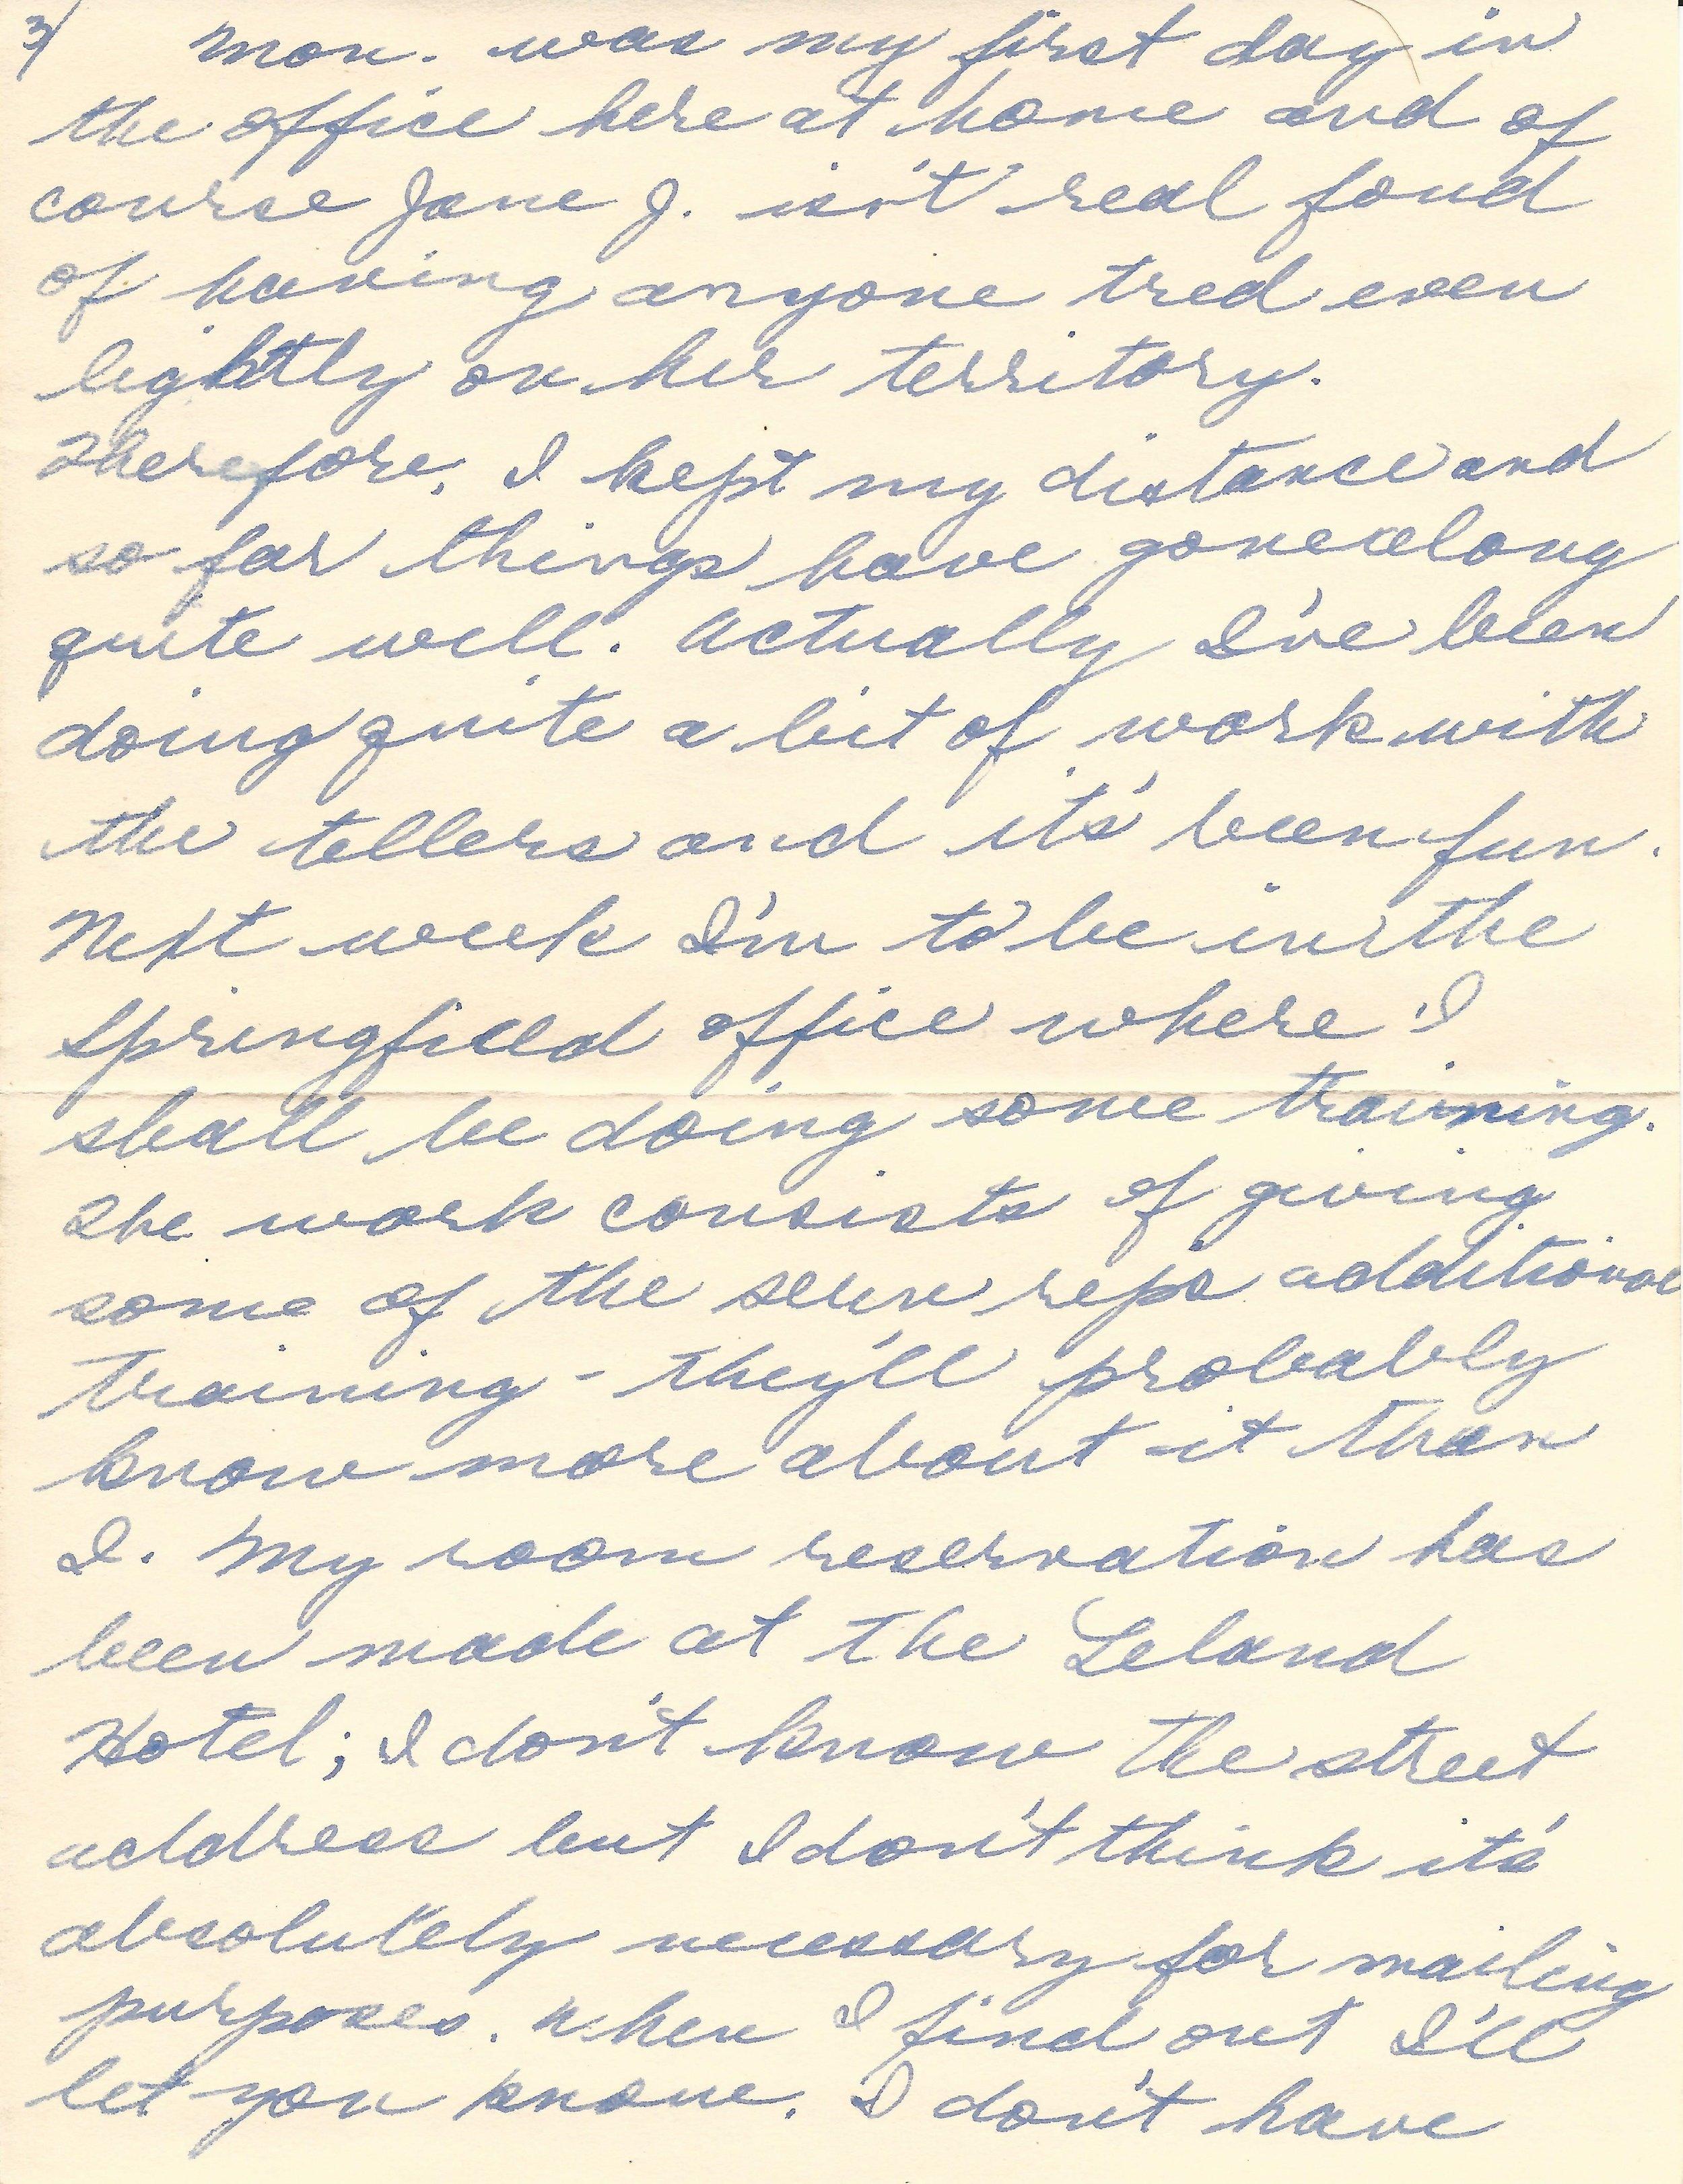 3. Nov. 4-5, 1952 (Oma)_Page_4.jpg